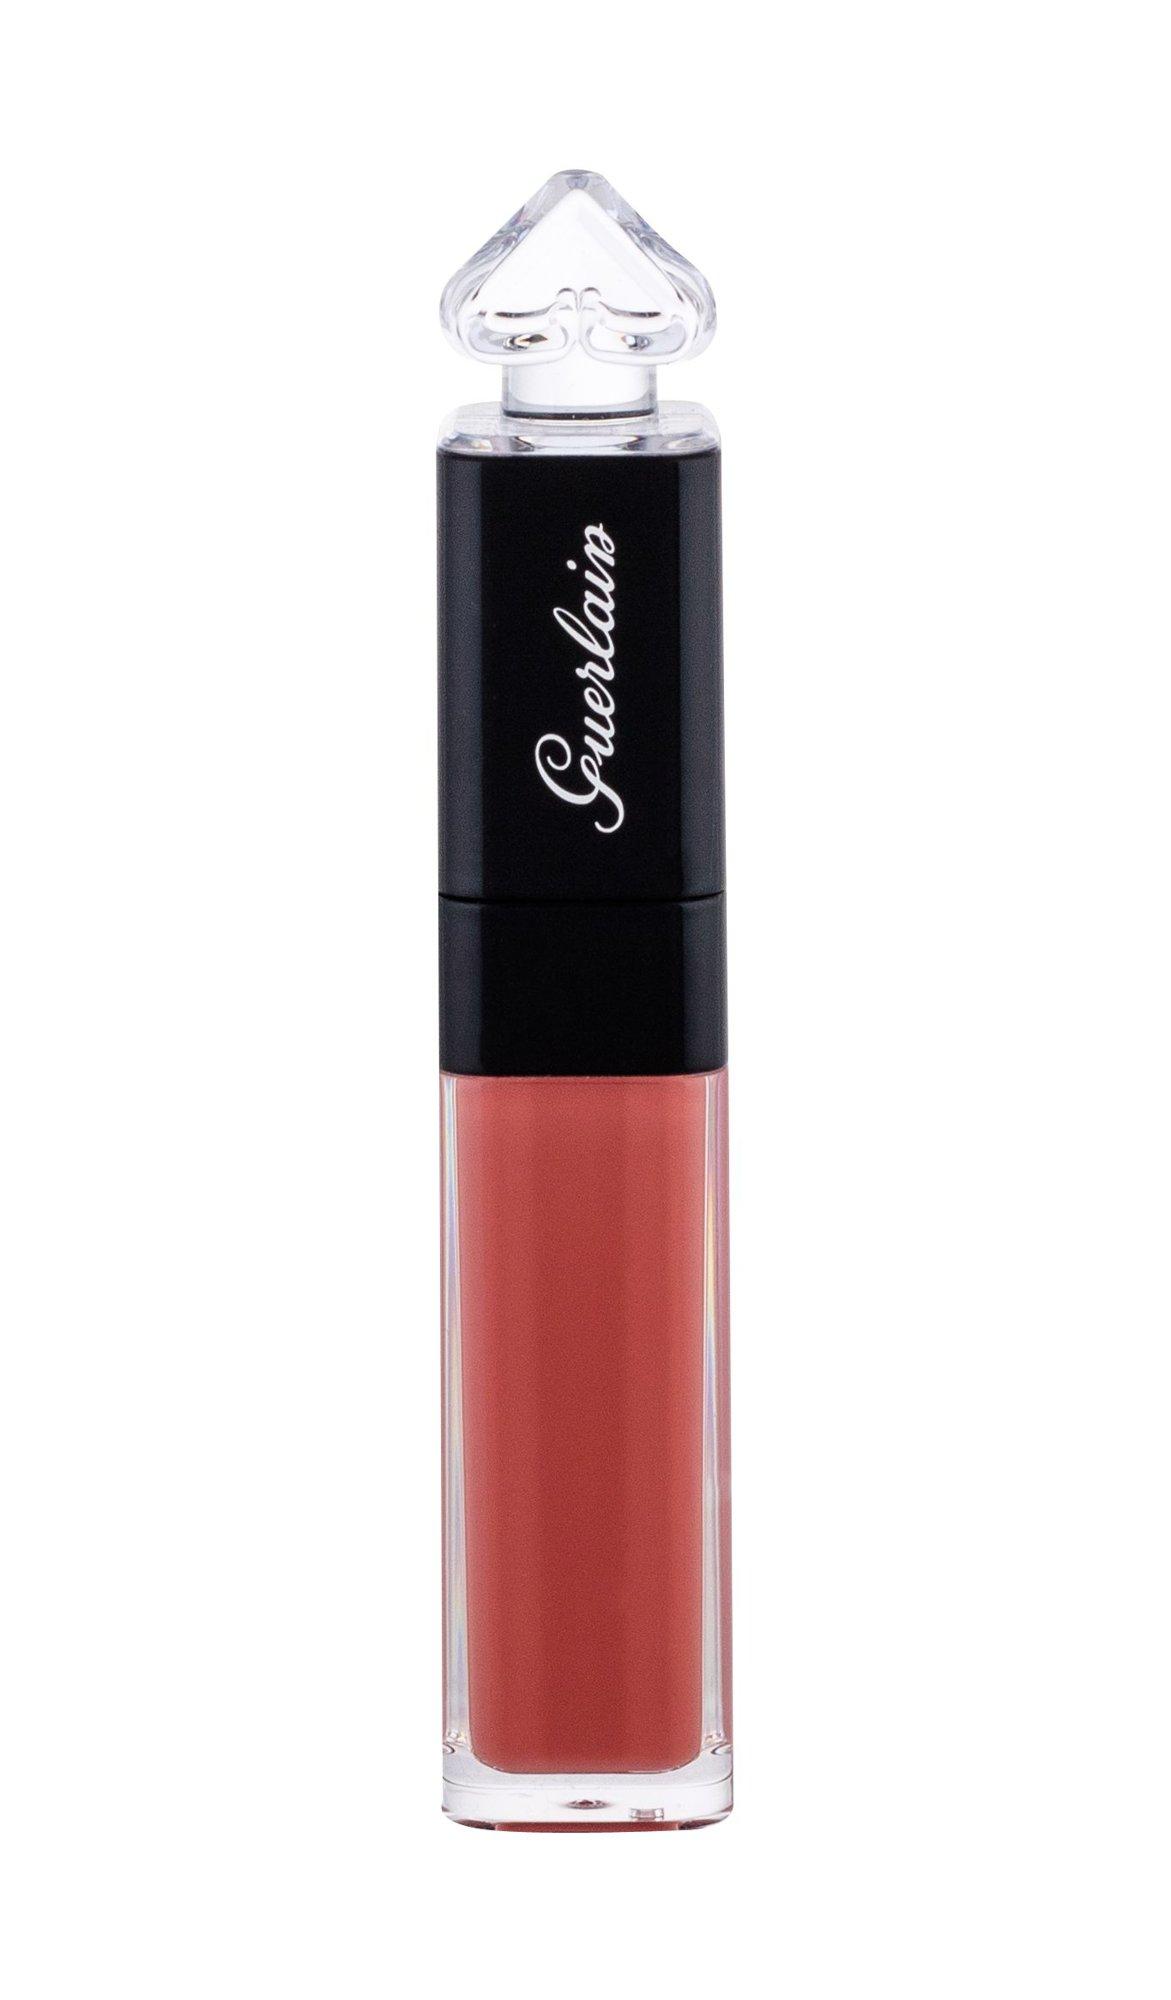 Guerlain La Petite Robe Noire Lipstick 6ml L112#No Filter